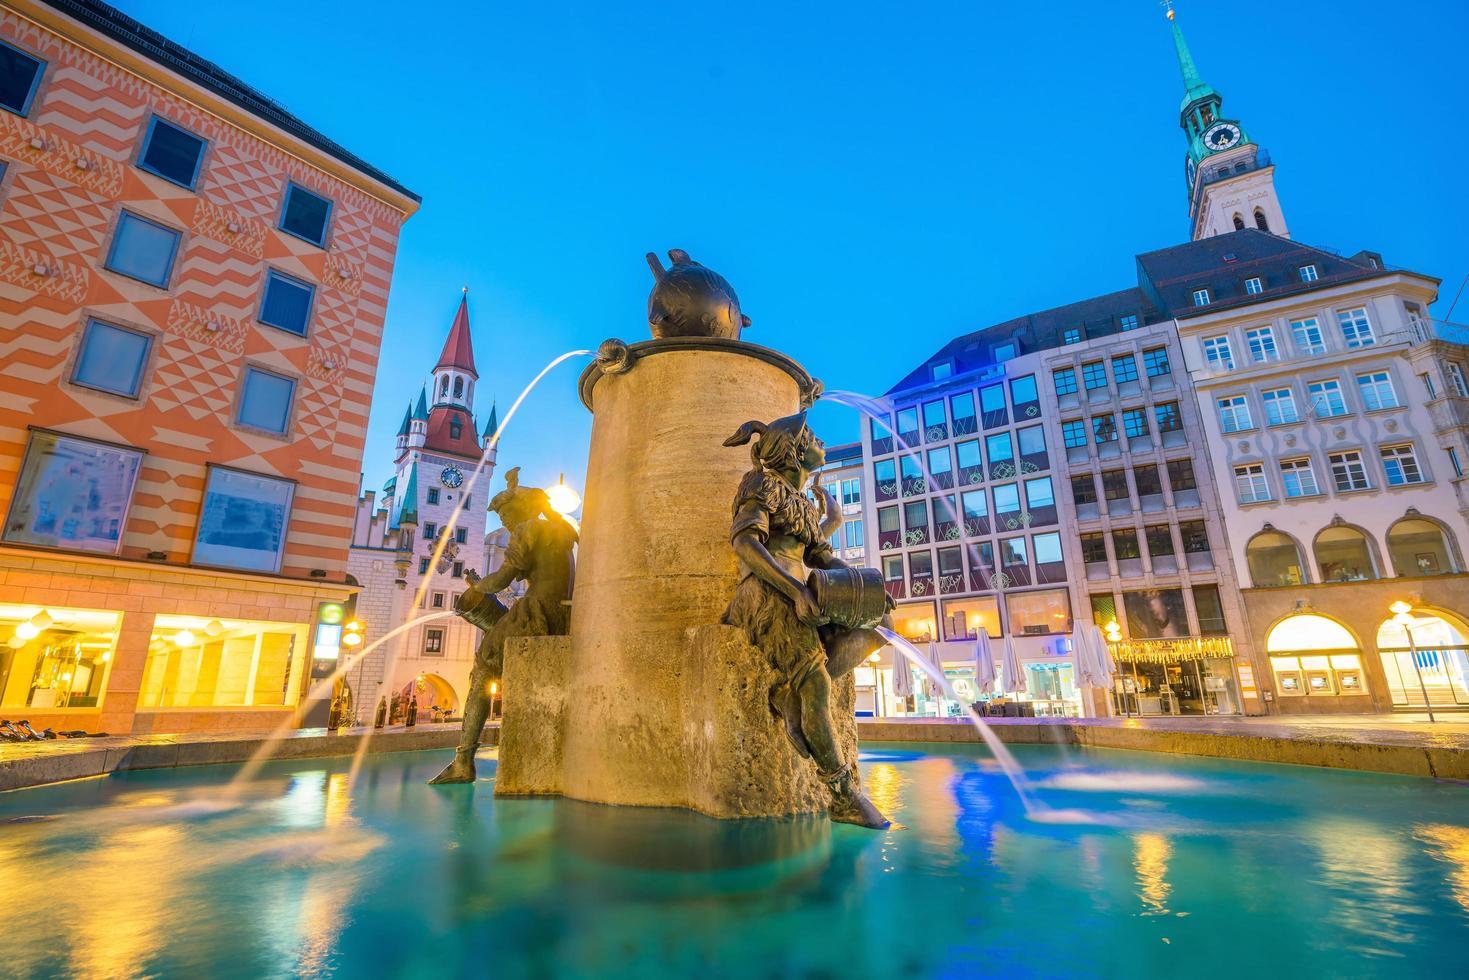 Old Town Hall at Marienplatz Square in Munich photo